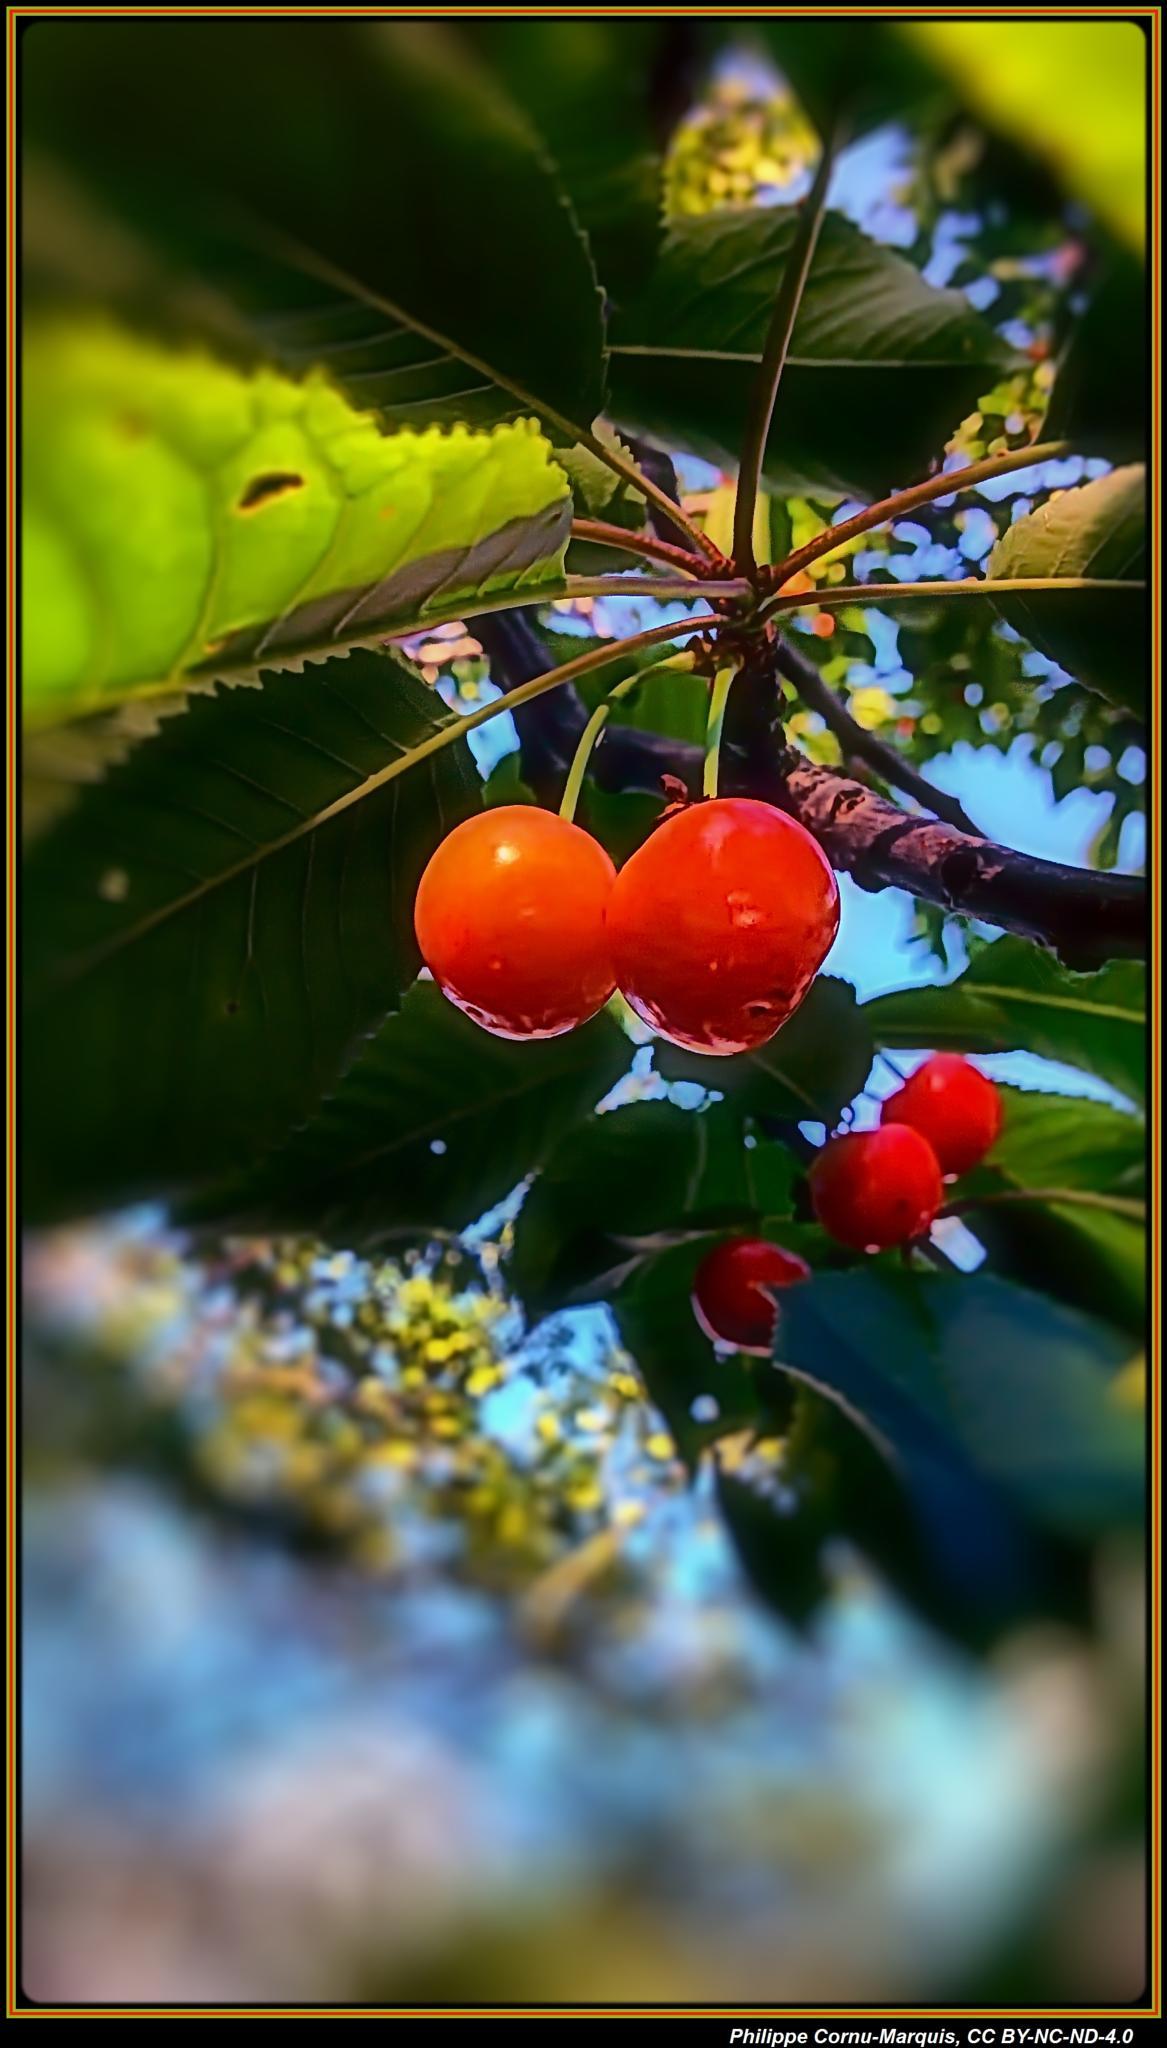 More Cherries by Philippe Cornu-Marquis